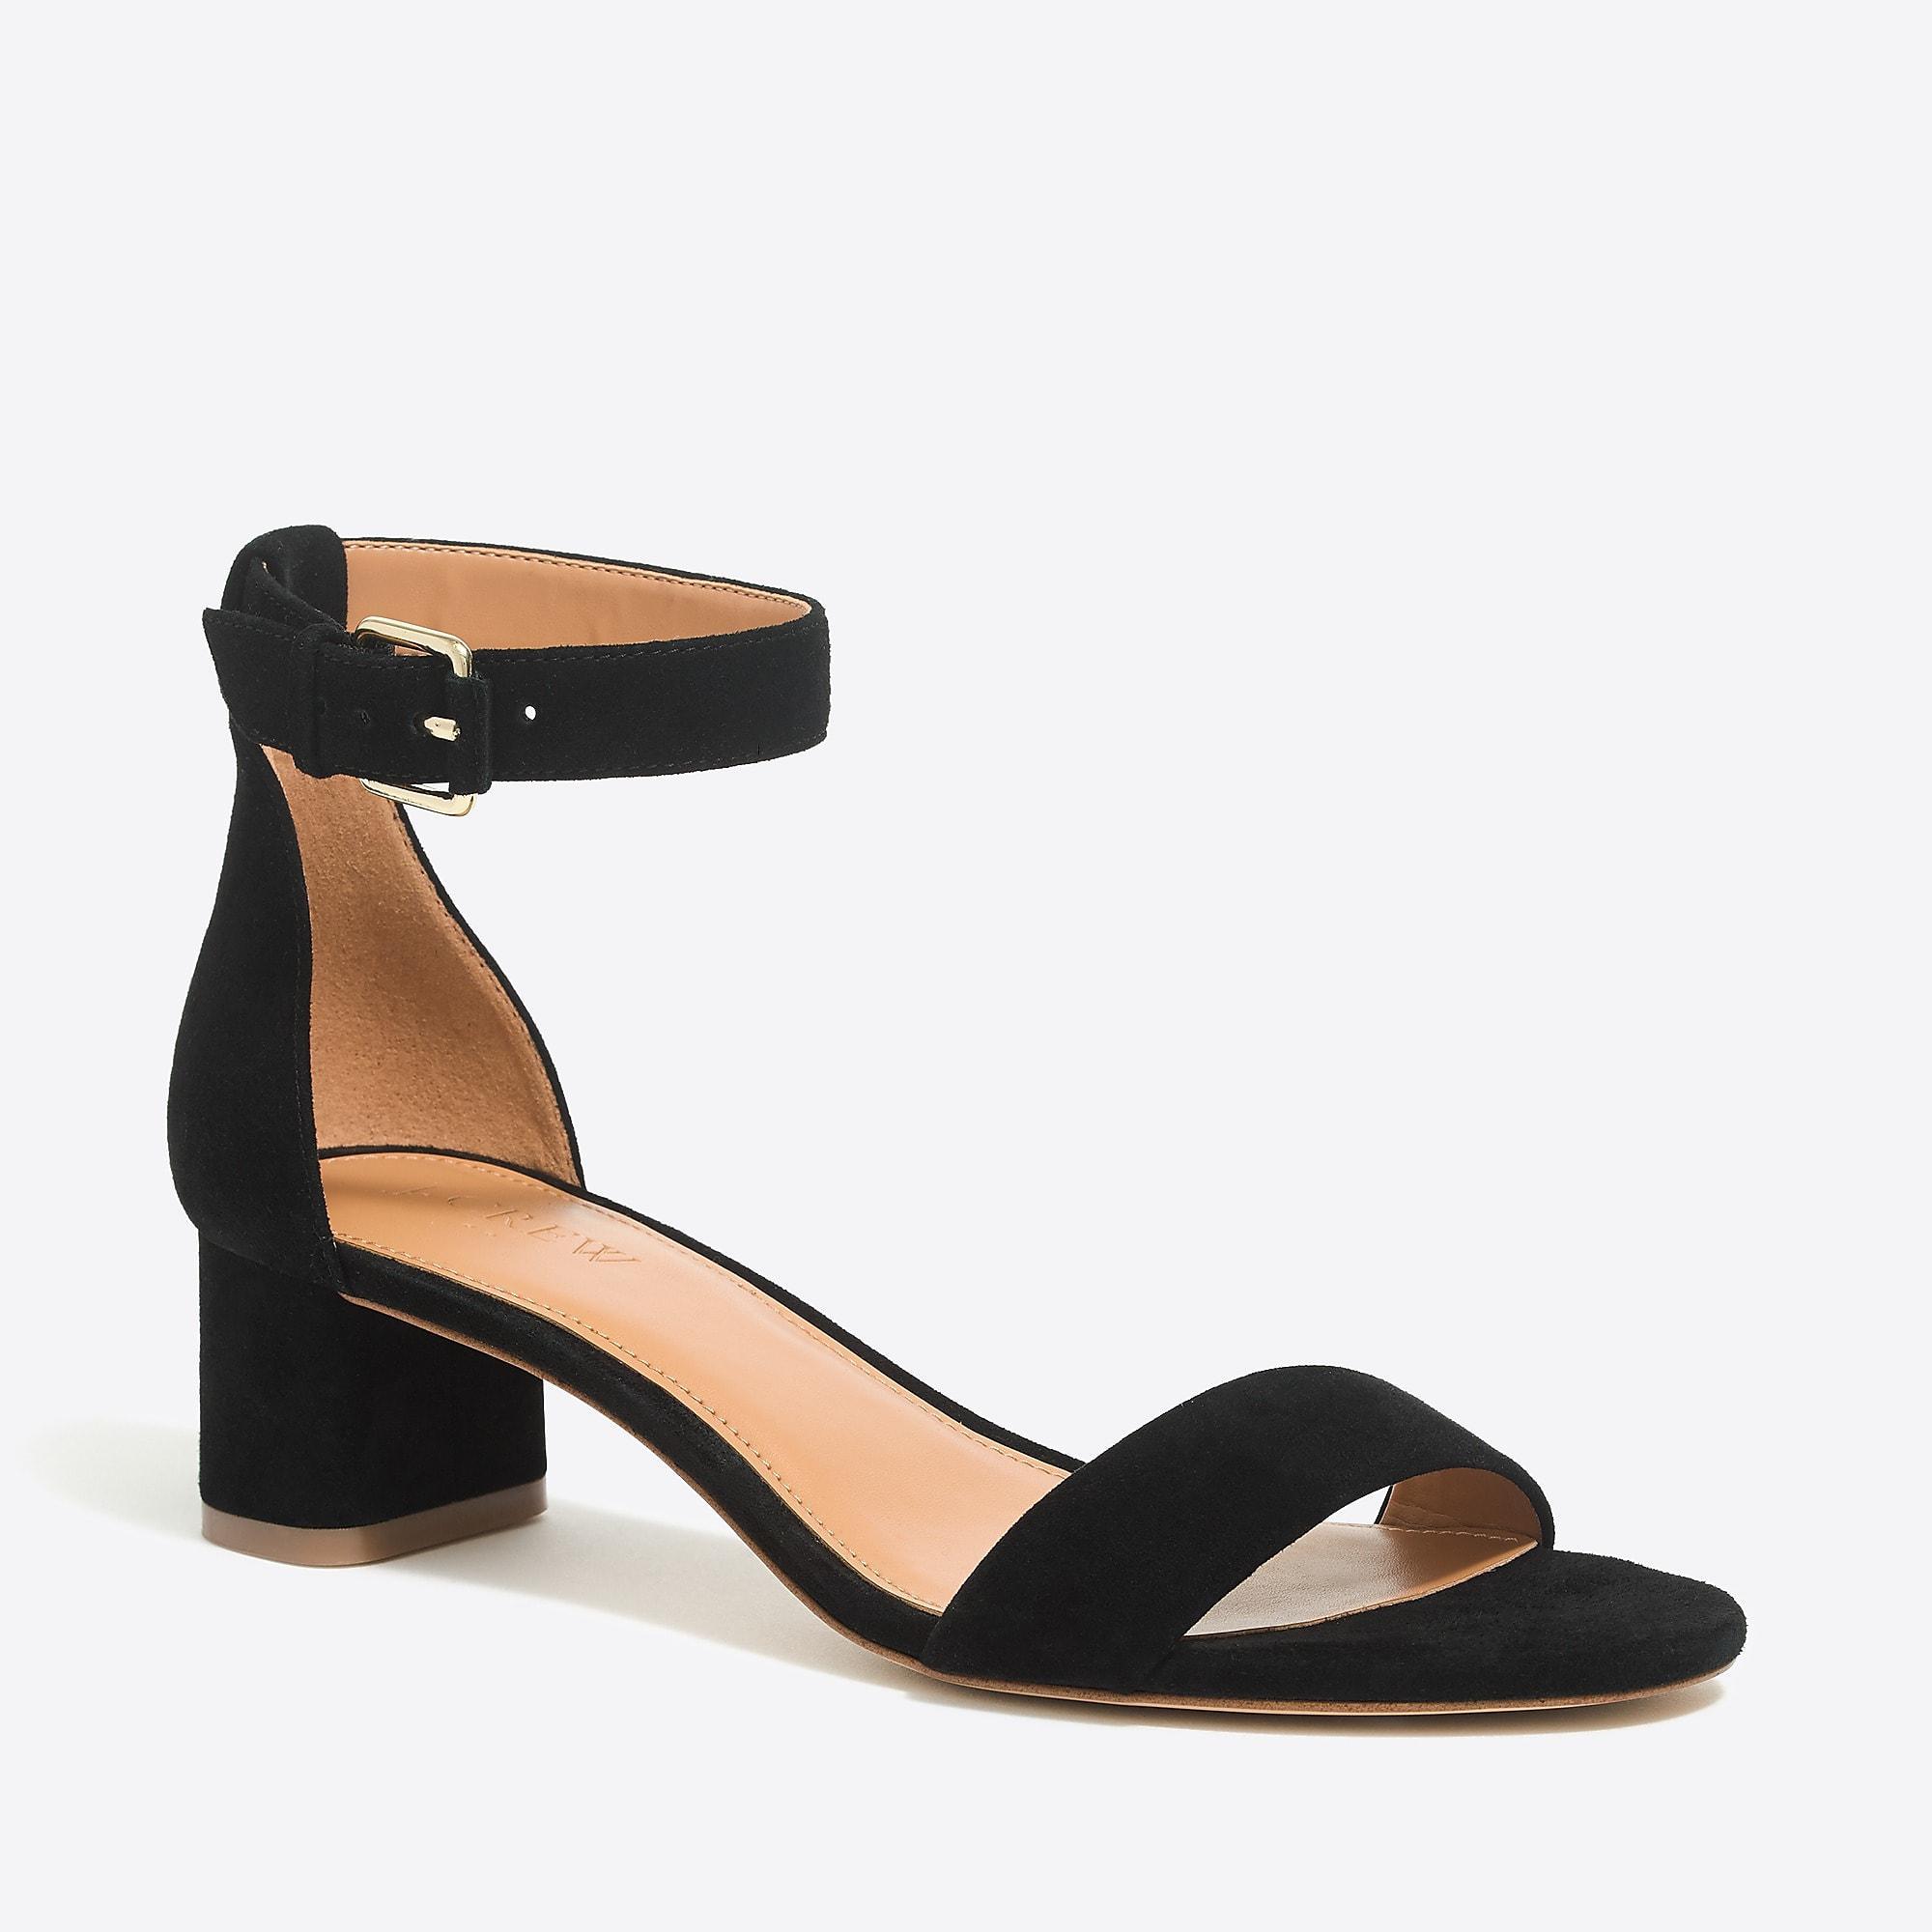 J.CREW STRAPPY LADY ALICE - Sandals - black